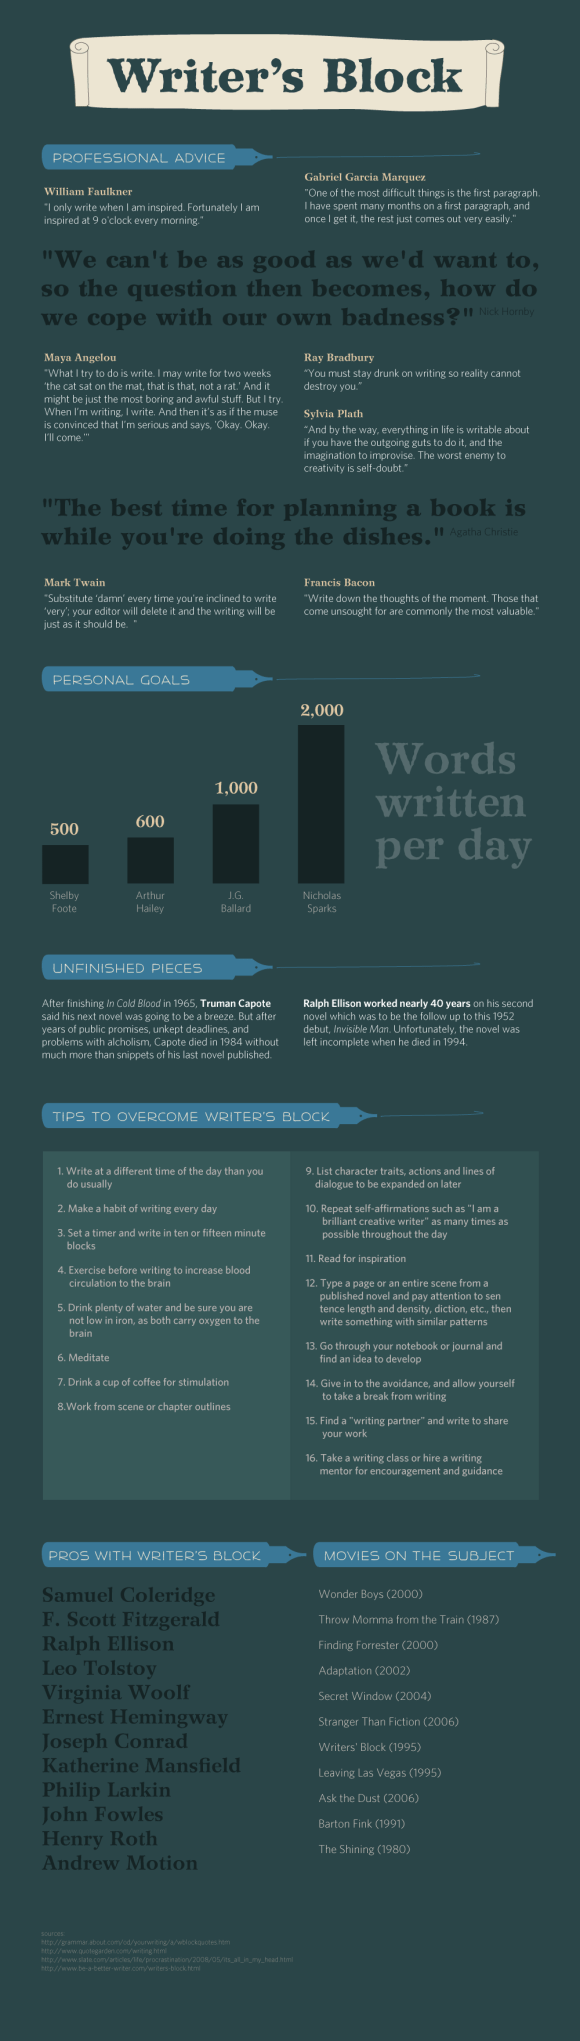 1 writersblock infographic 4 Best Writers Block Infographics